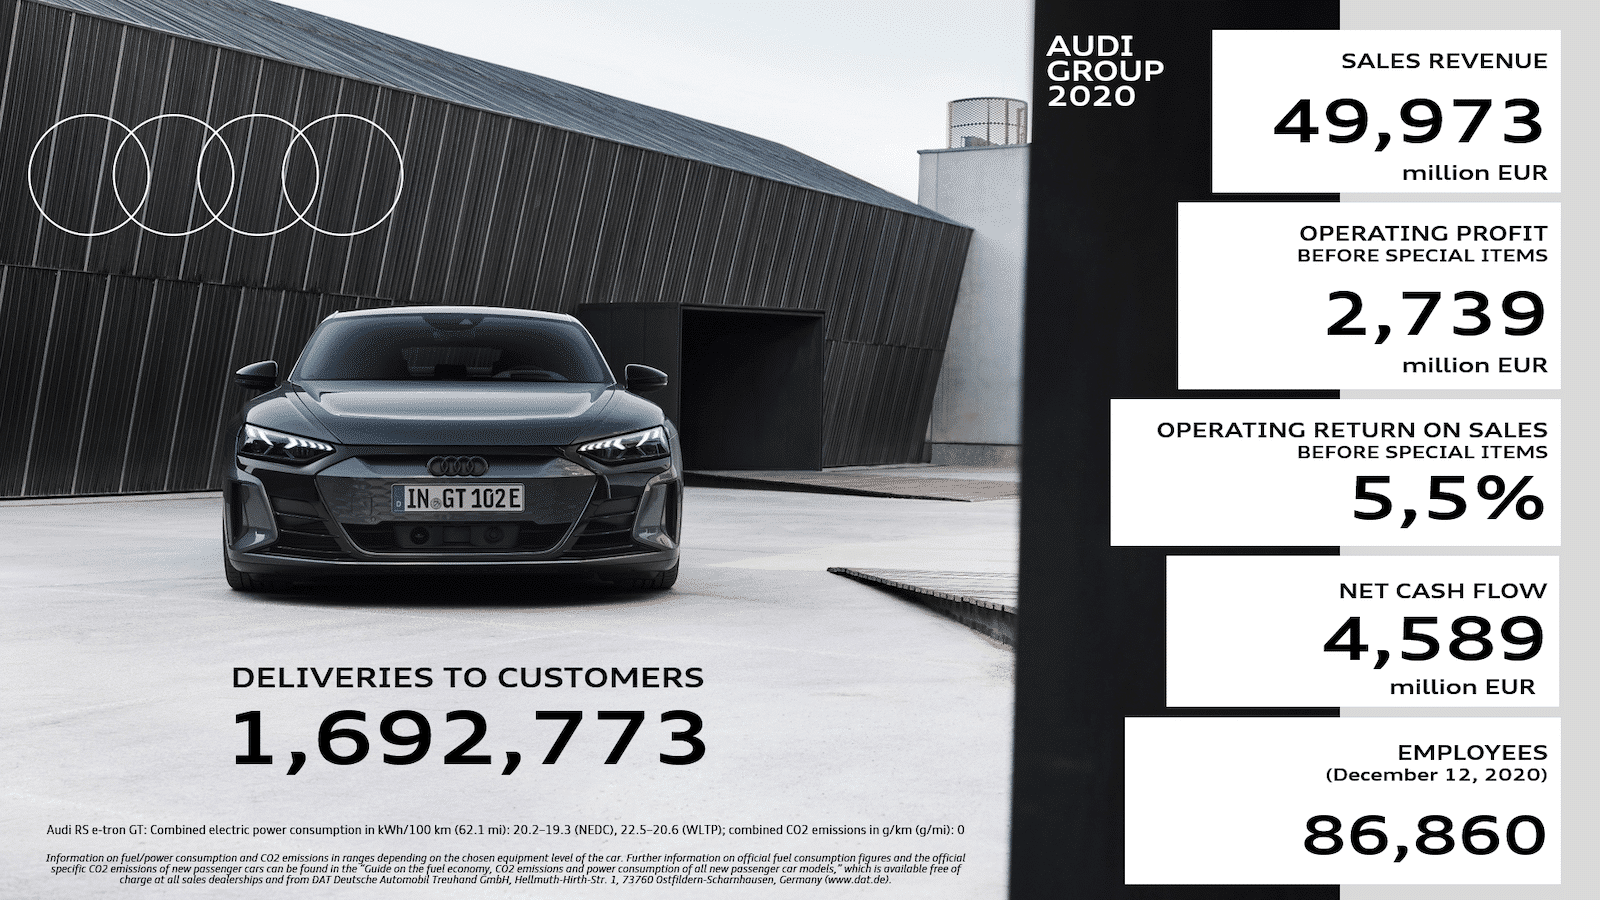 Audi 2020 earnings graphic